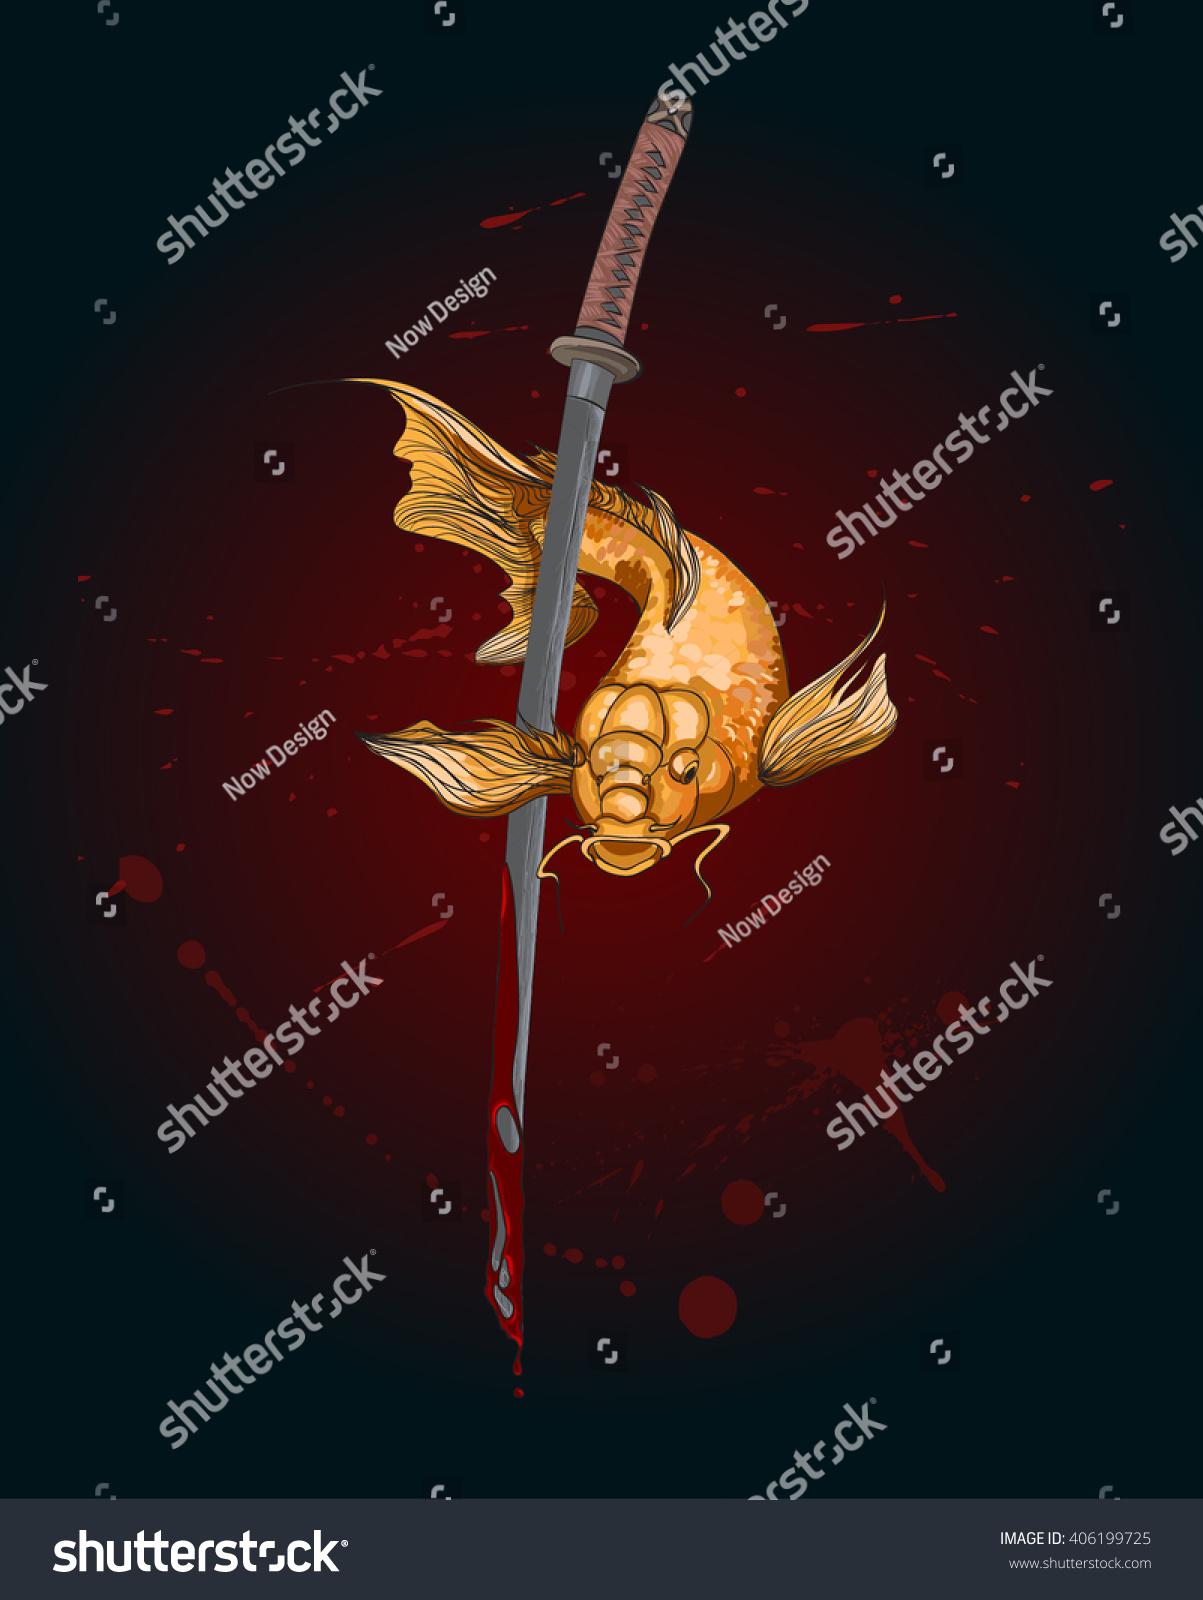 Koi Fish Katana Sword Tattoo Koi Stock Vector 406199725 - Shutterstock